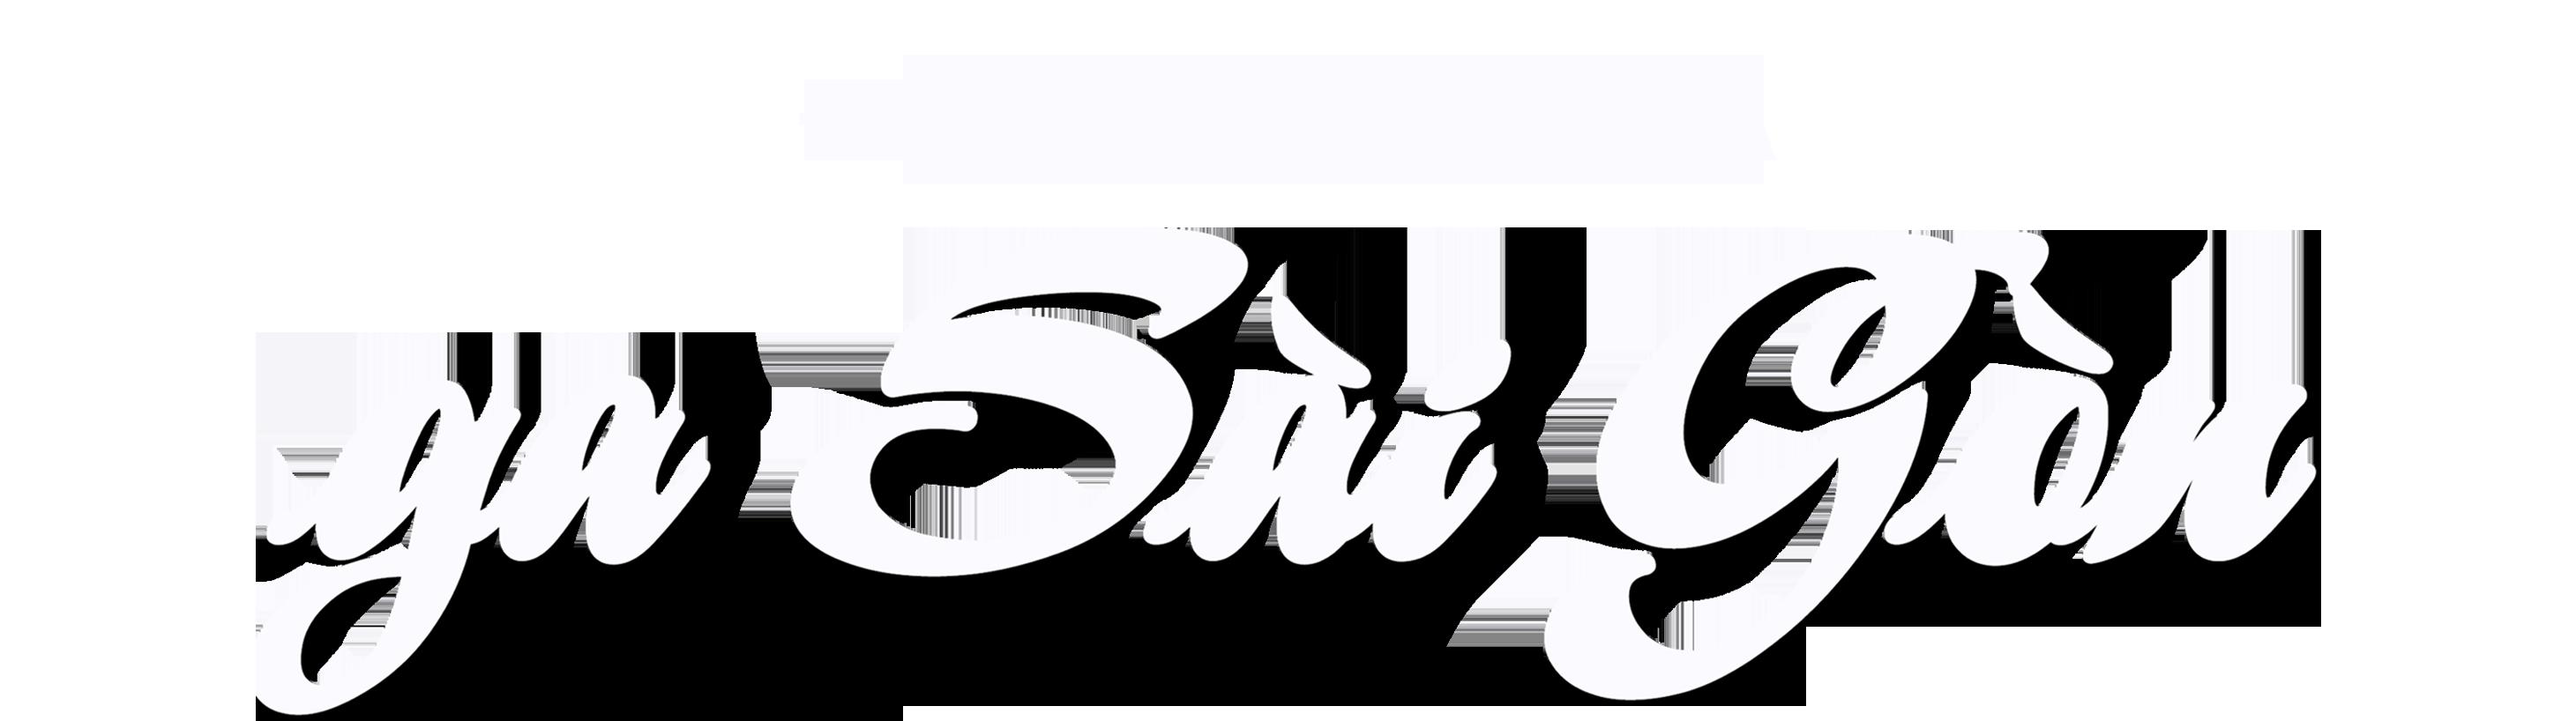 GA SÀI GÒN . VN